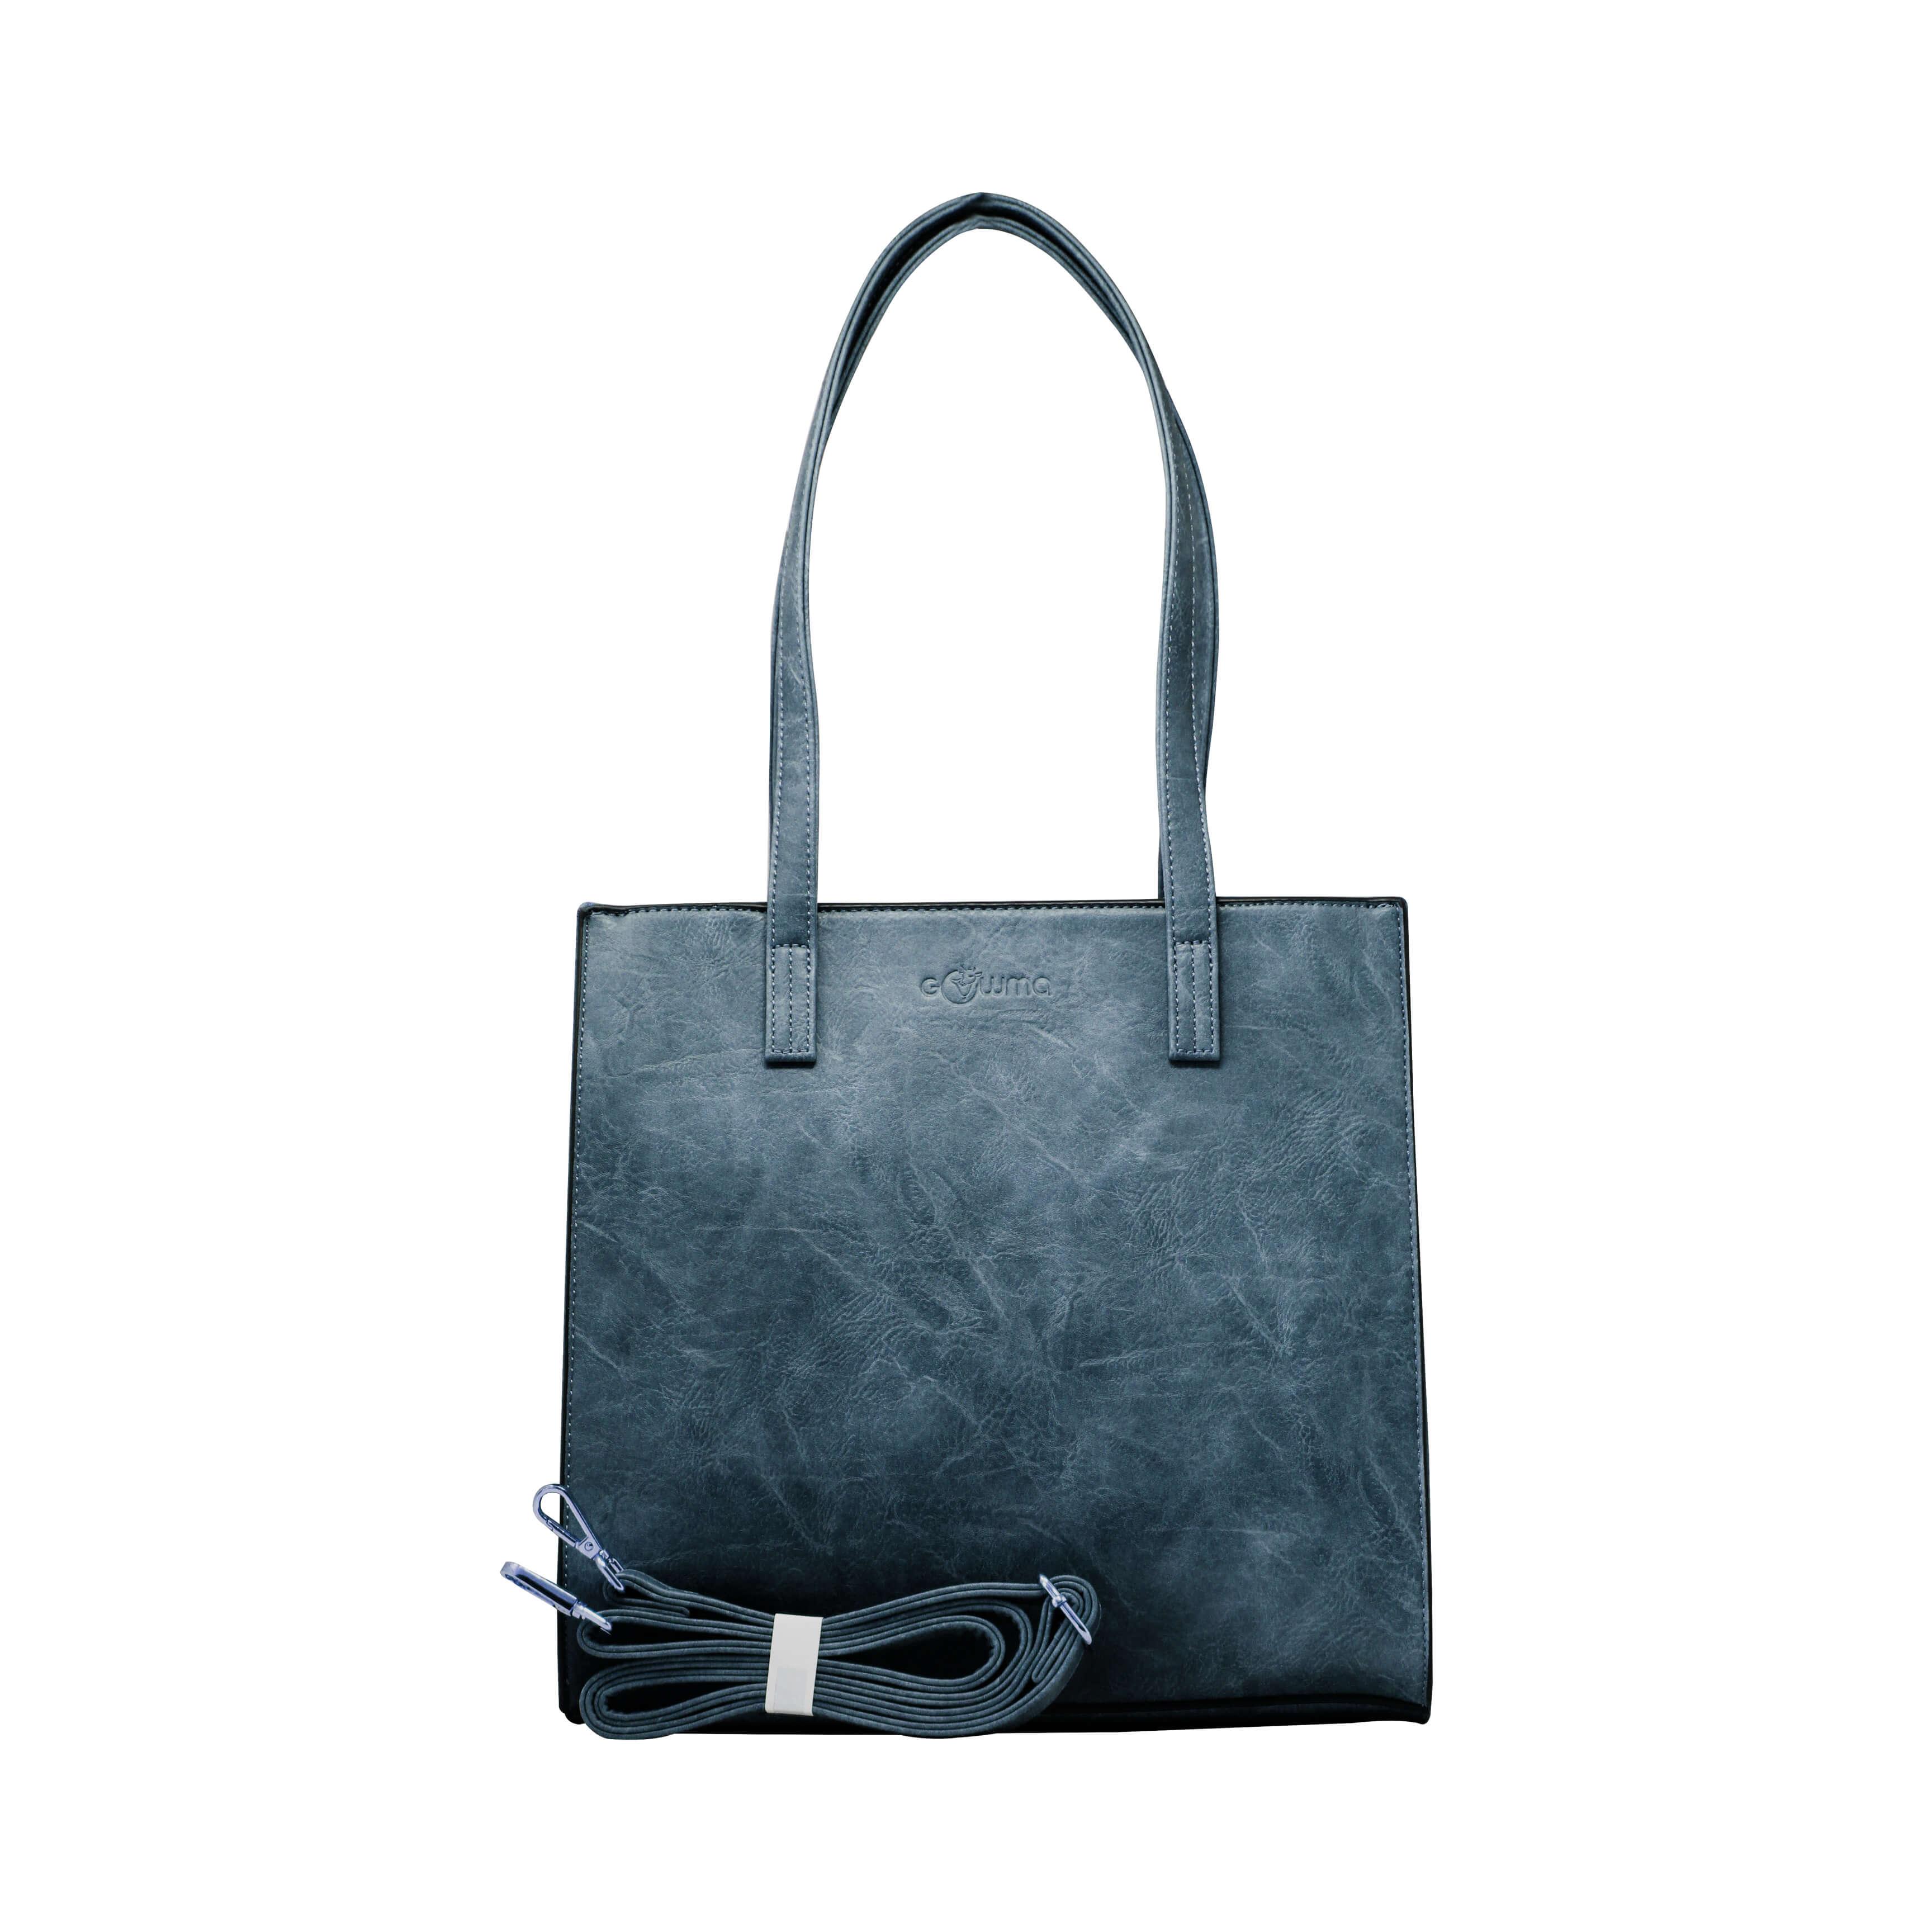 RECTANGULAR BOARDED BAG (RB)-BLUE 5